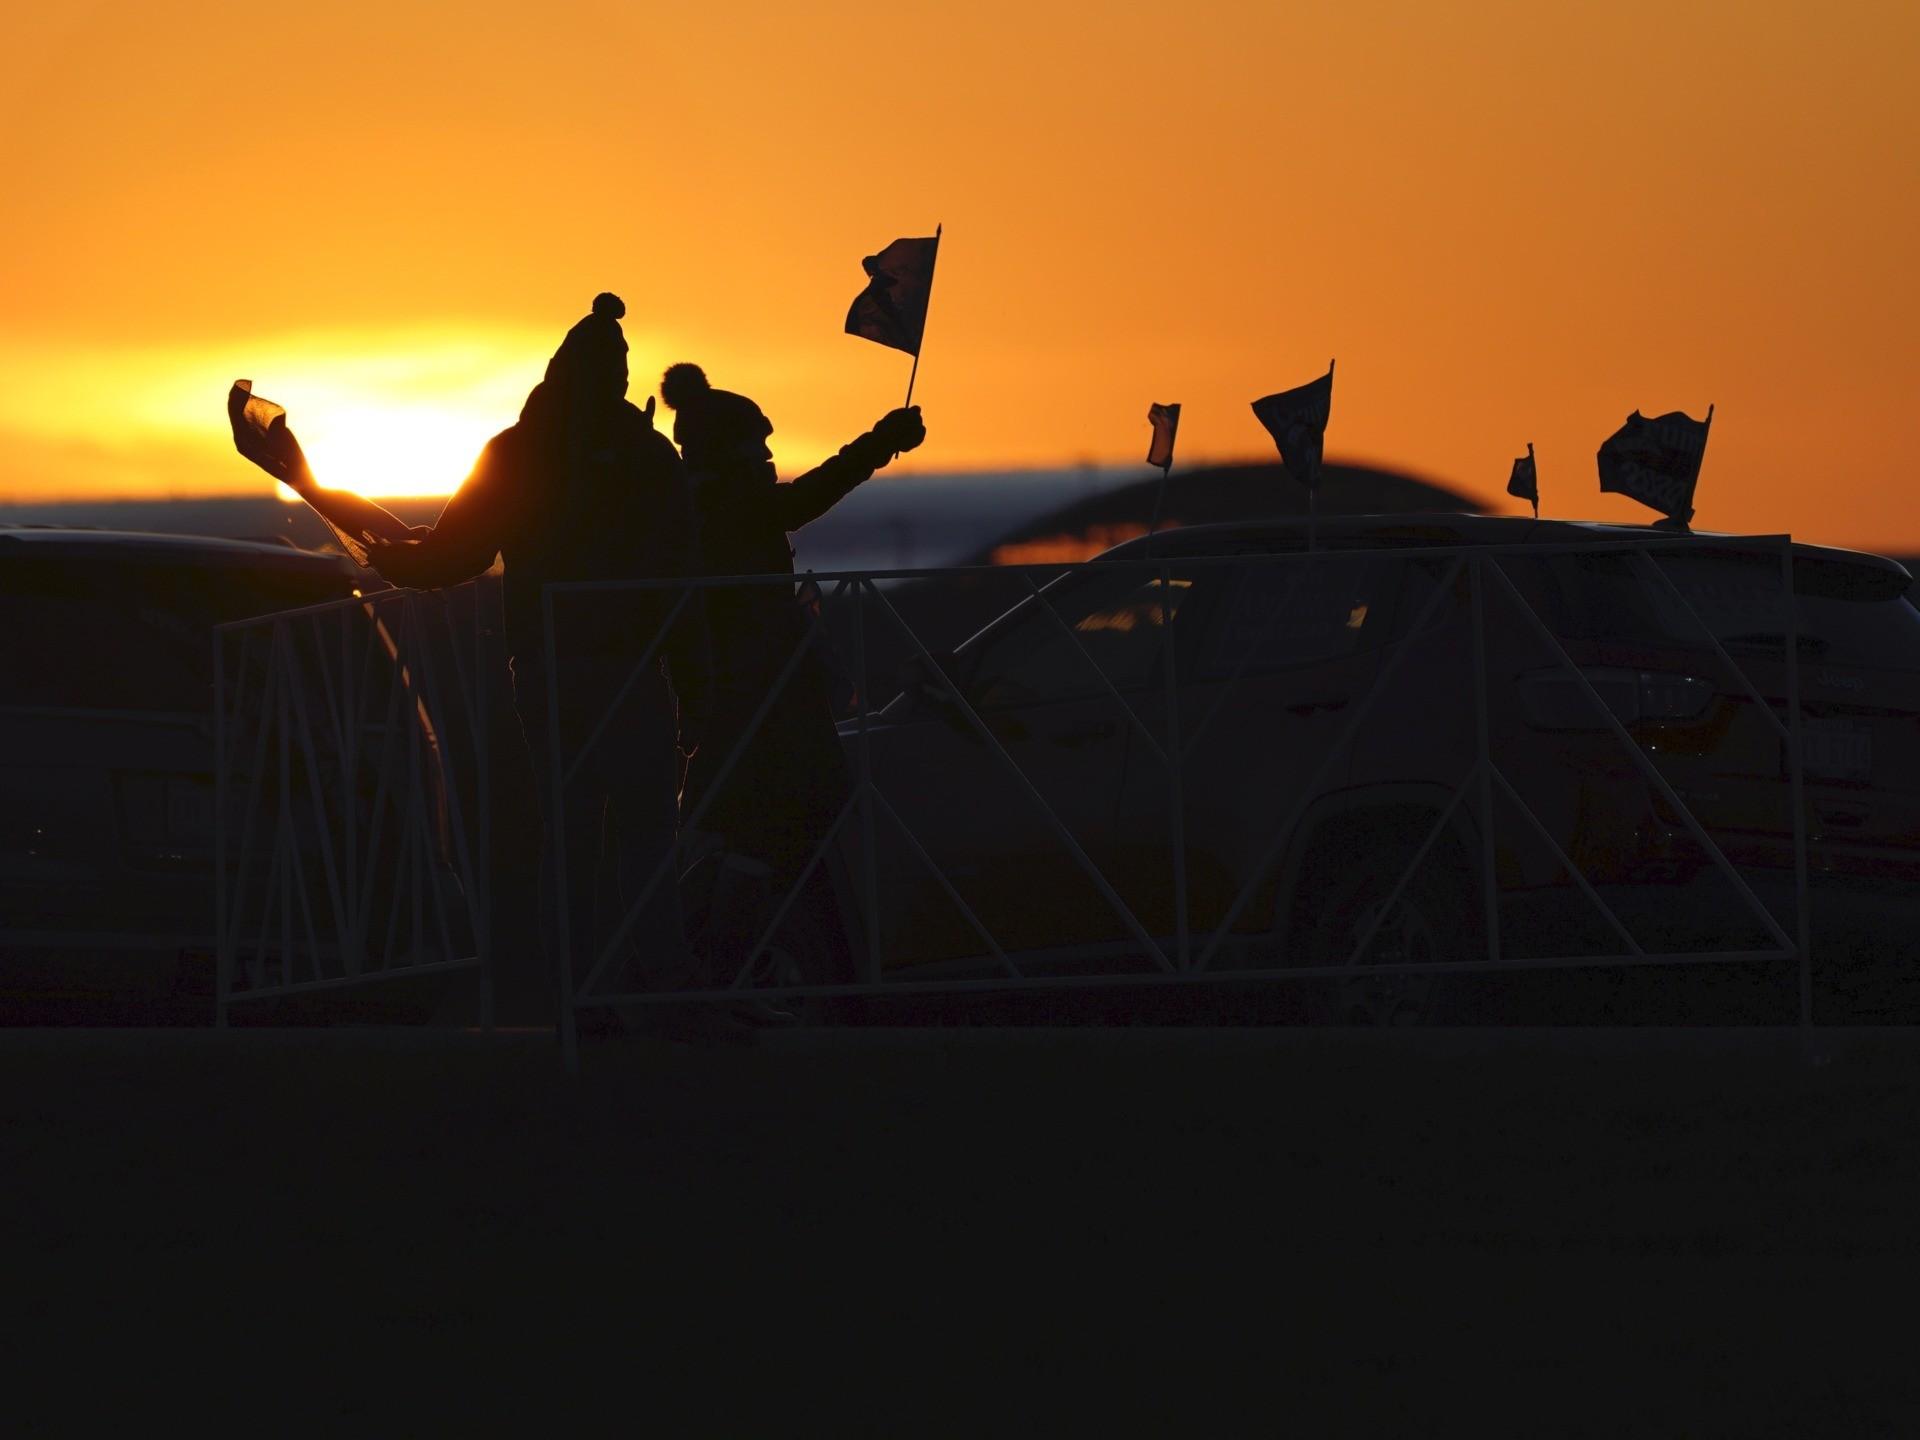 Sunset Grand Rapids (Carlos Osorio / Associated Press)